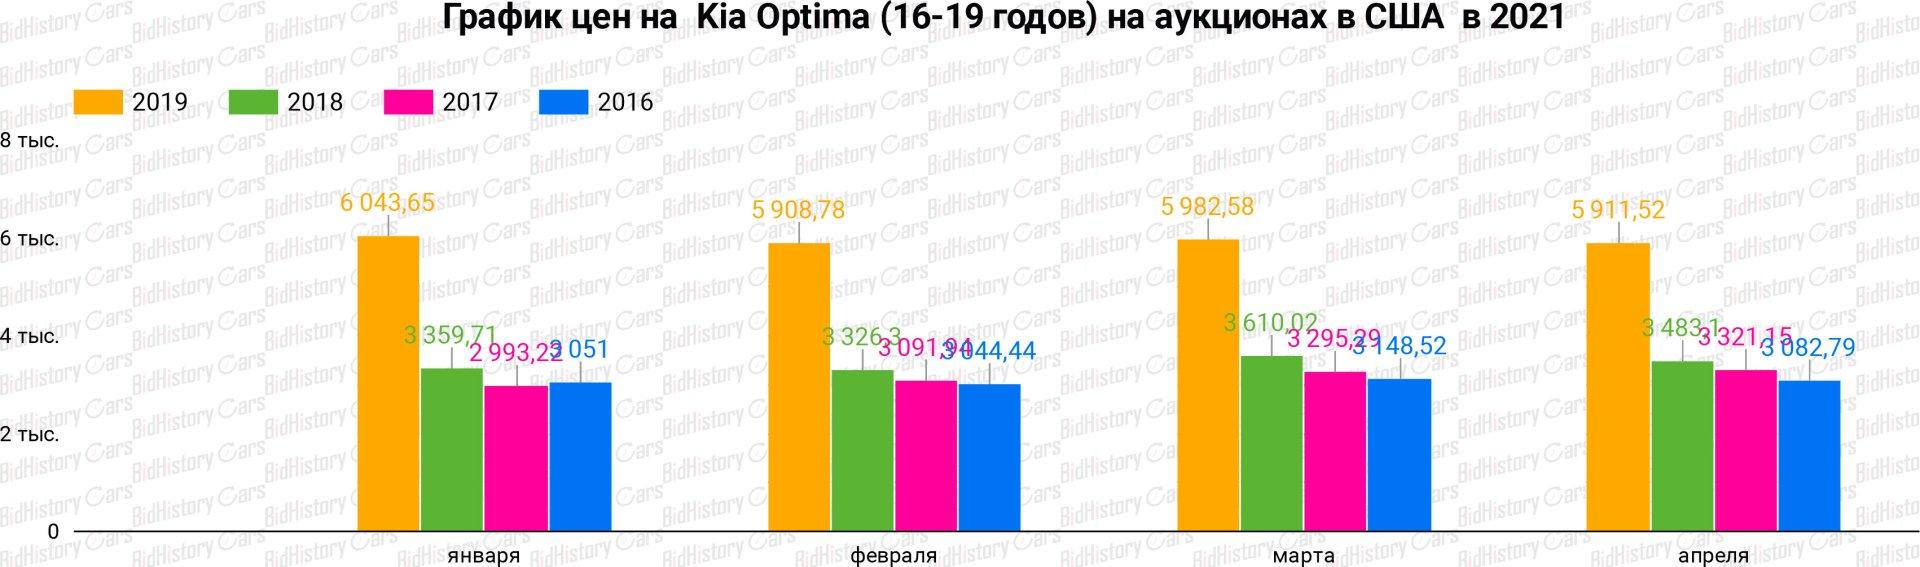 KIA Optima на аукционах с США 2021